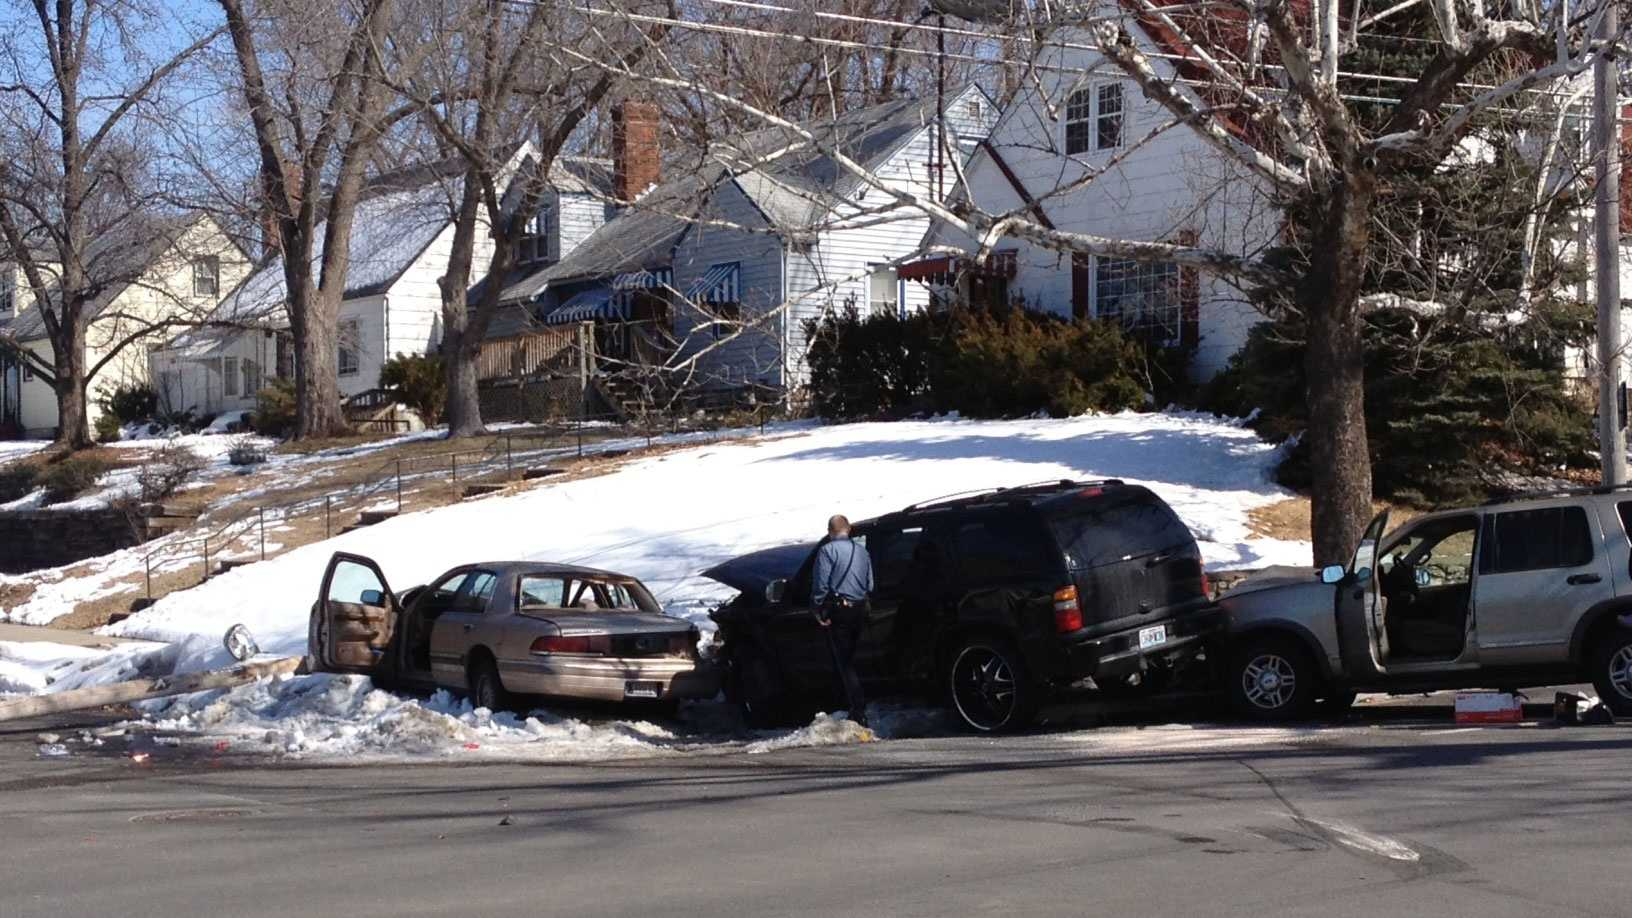 63rd Street, U.S. 71 accident